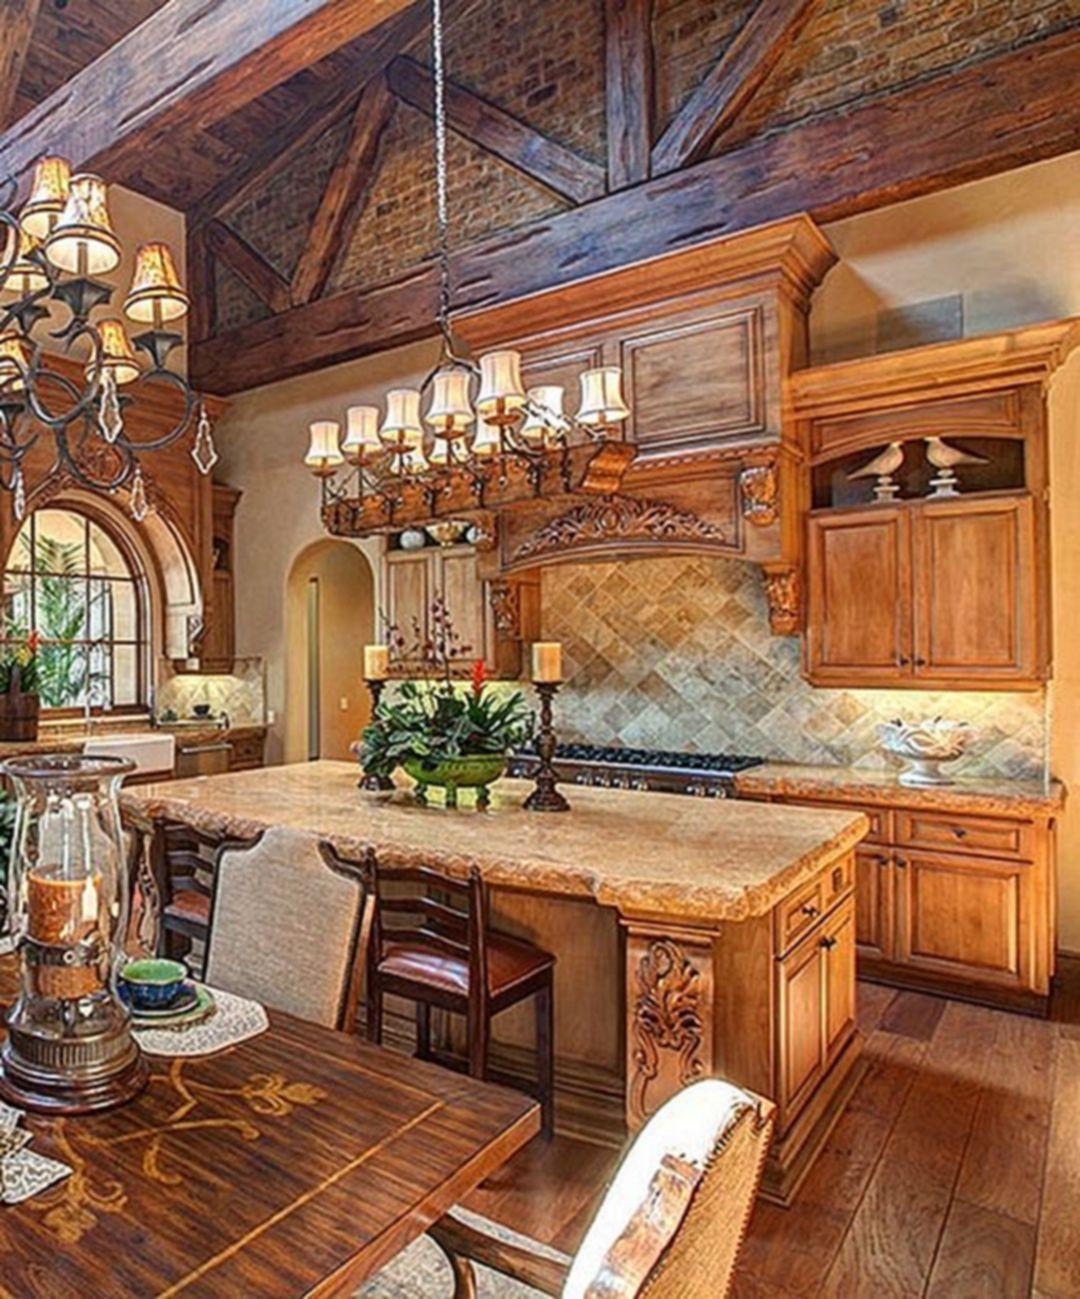 20+ Wonderful Italian Rustic Kitchen Decorating Ideas To ...